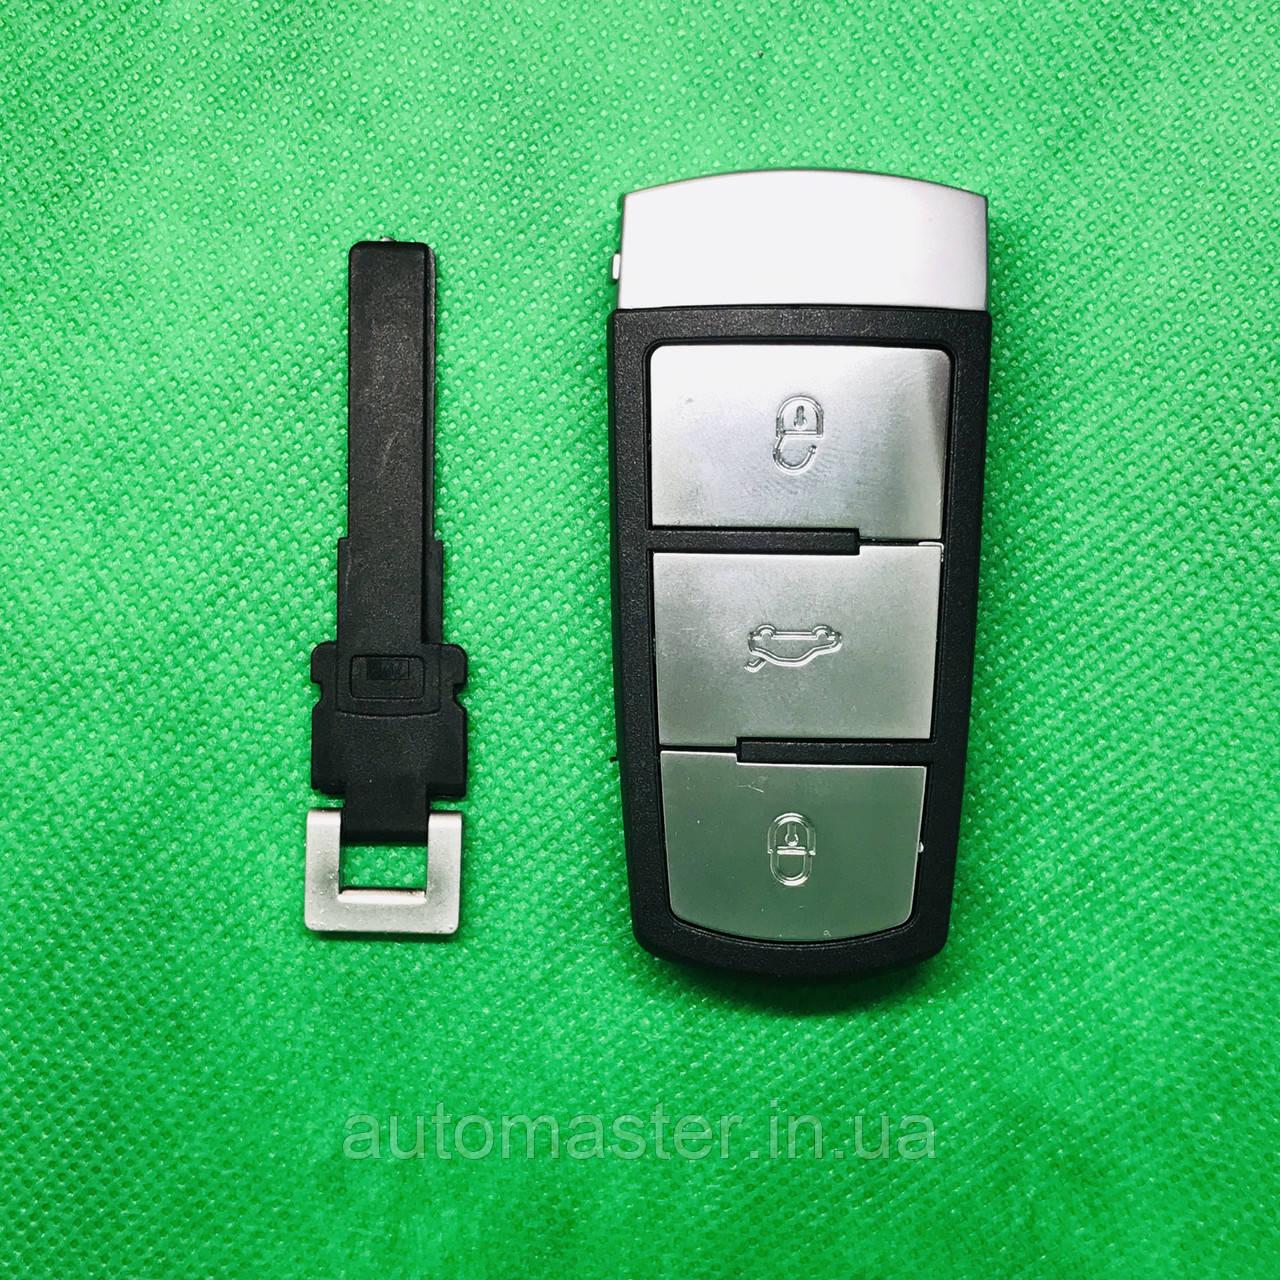 Корпус смарт ключа VOLKSWAGEN Passat (Фольксваген Пассат)  B6,B7,CC 3 - кнопки